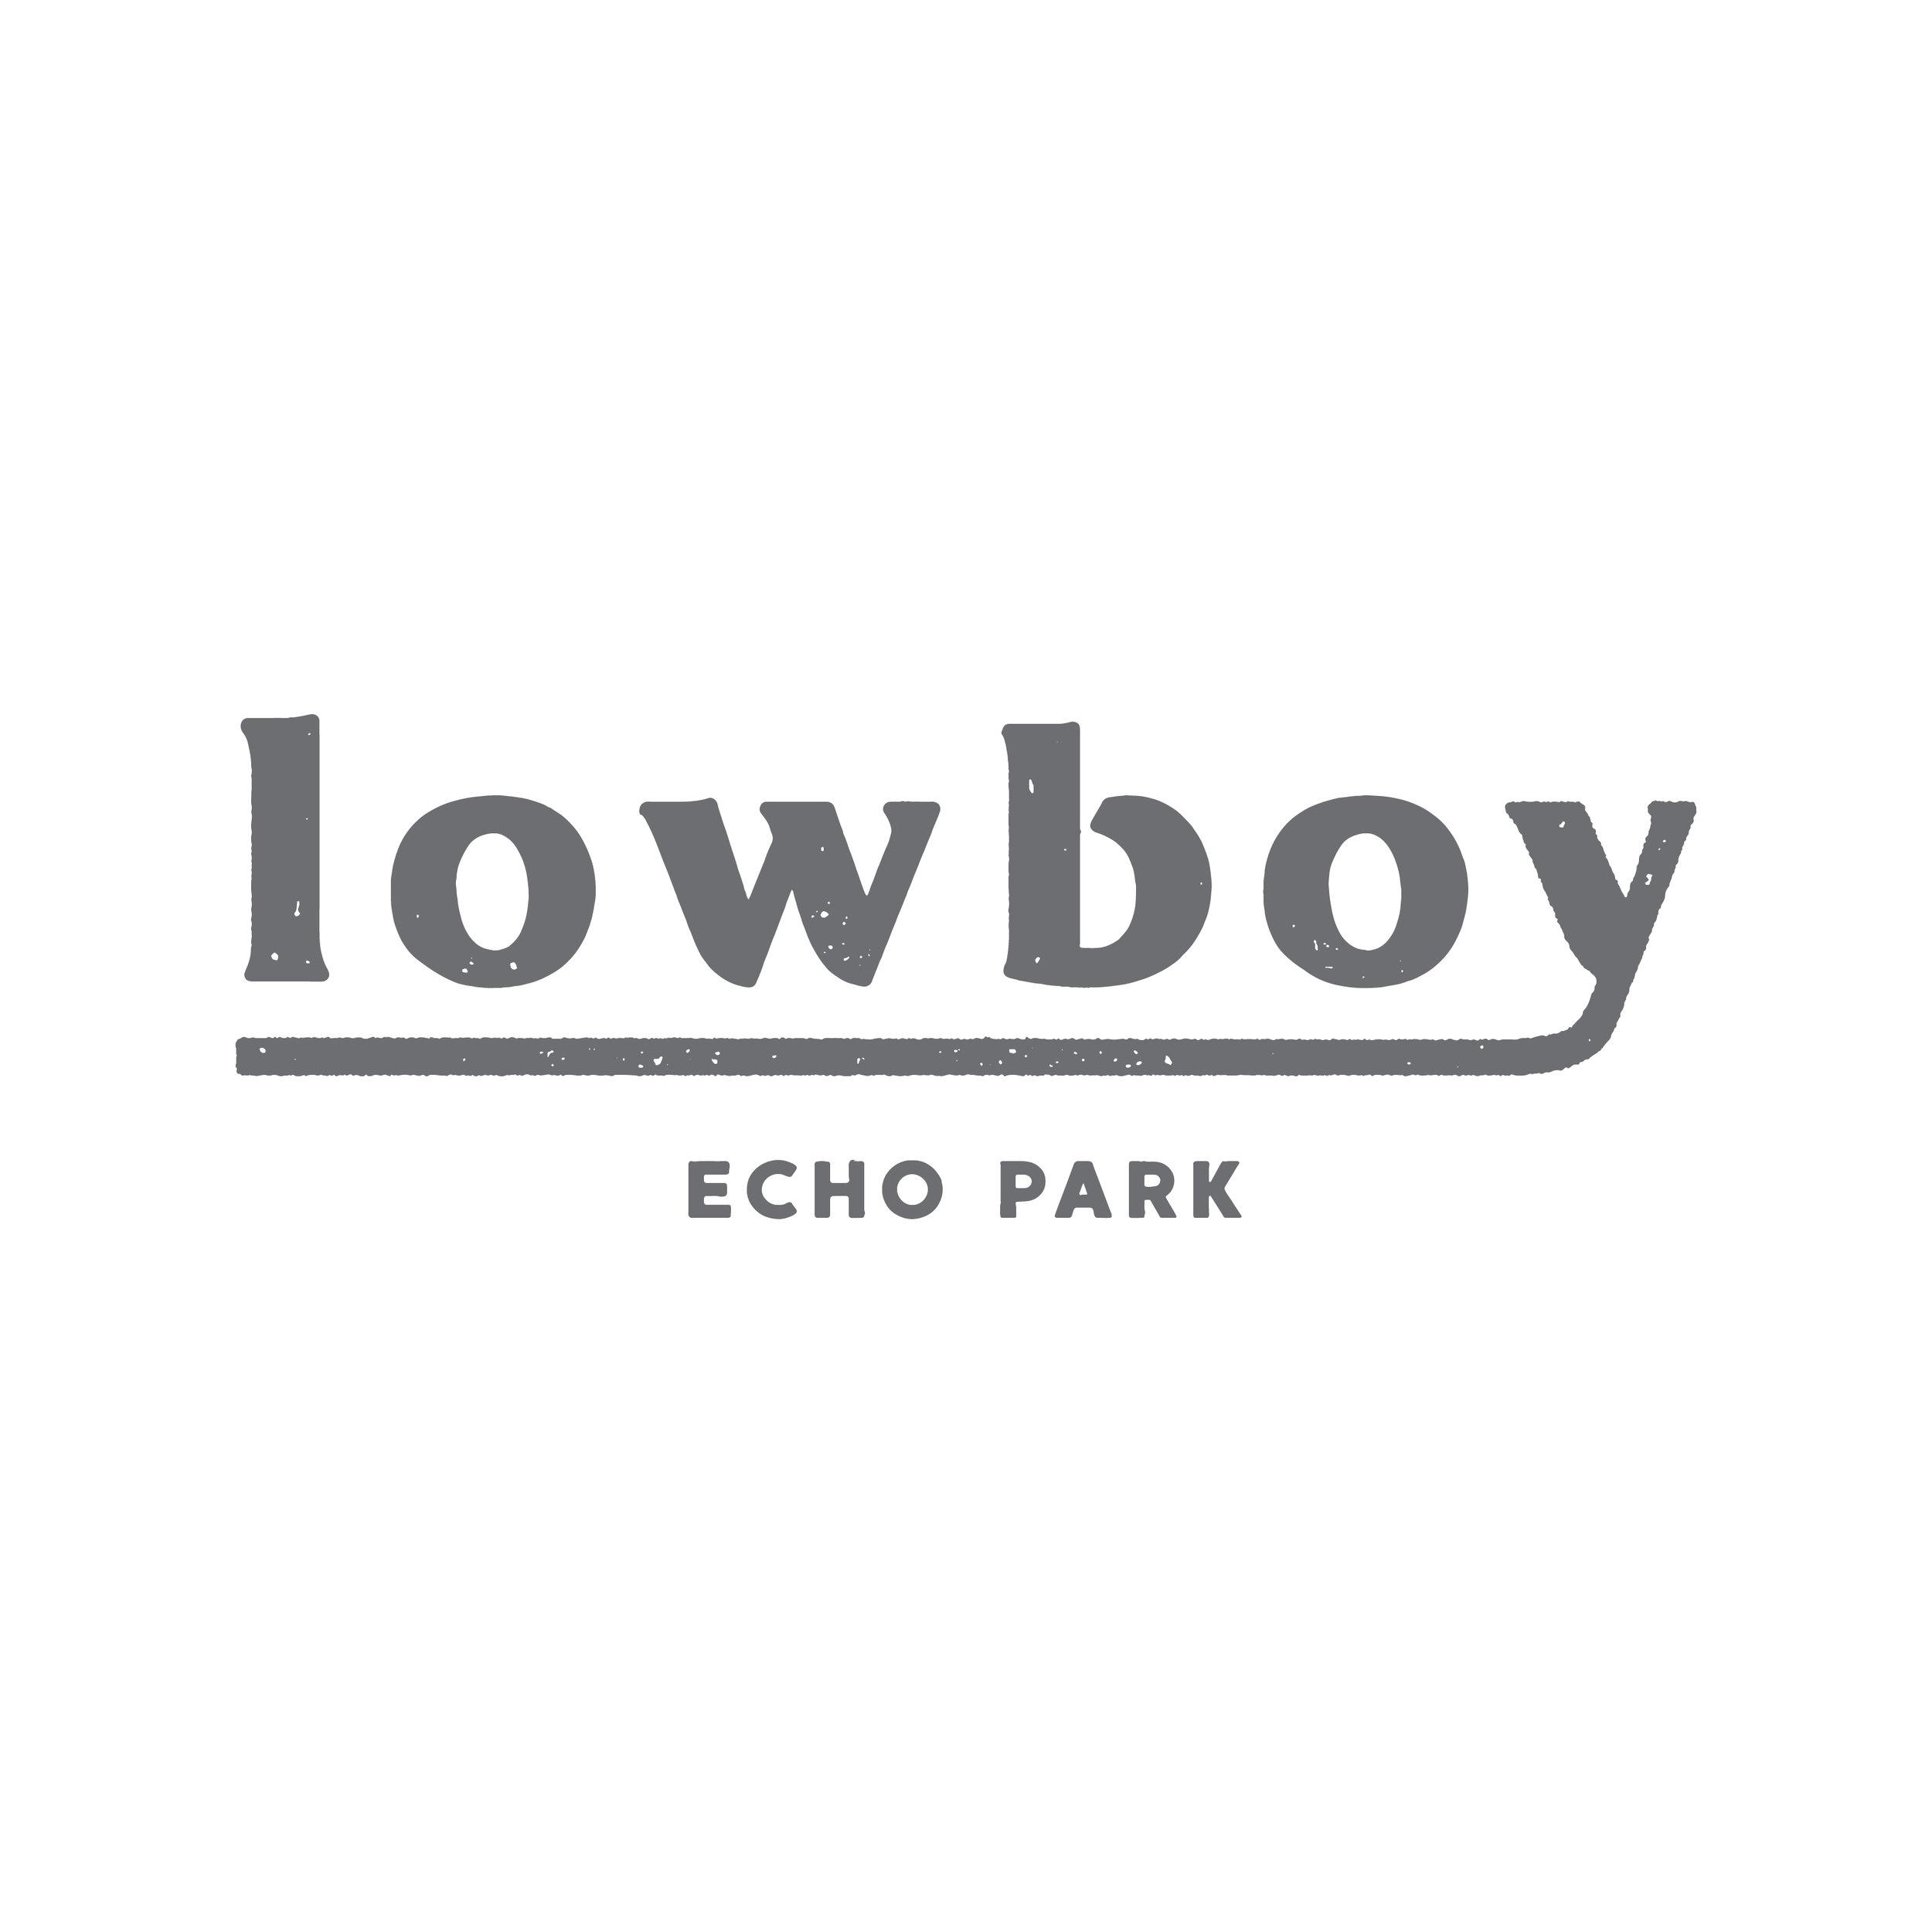 Lowboy-01.jpg